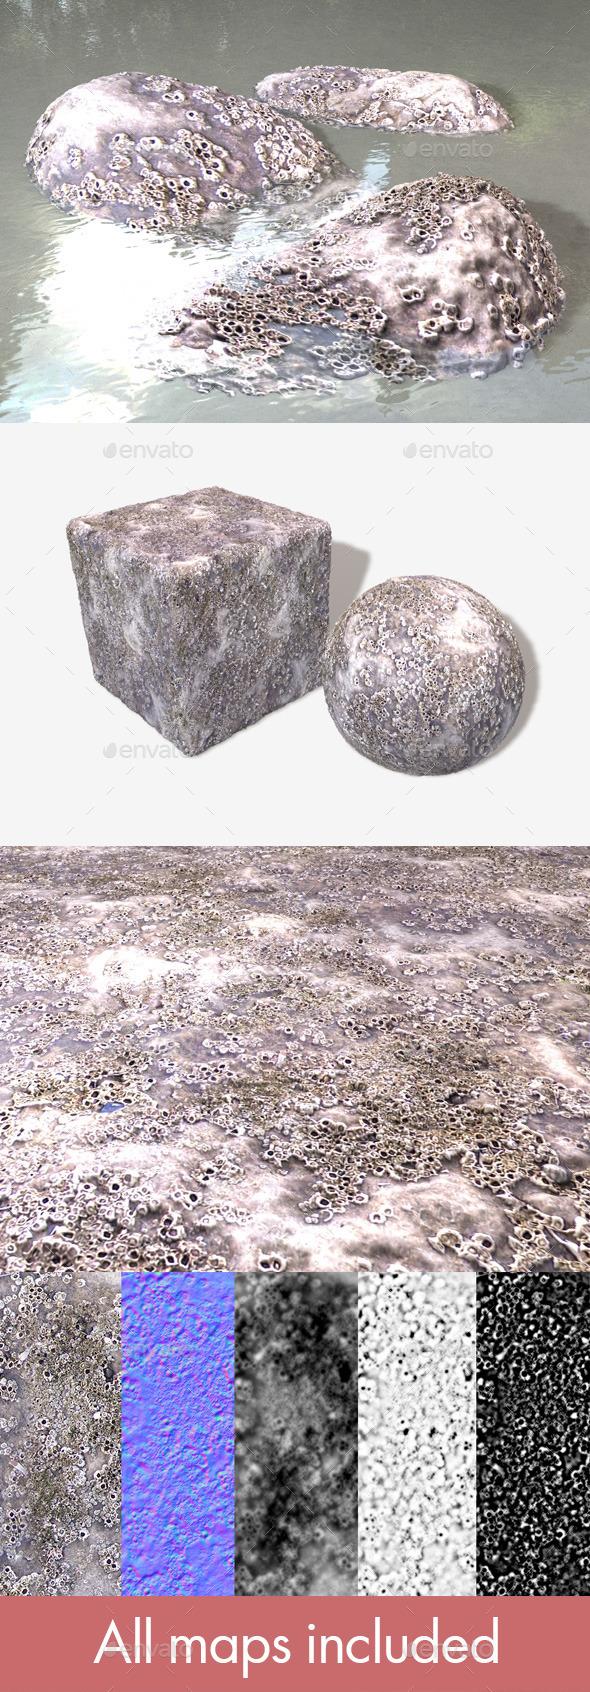 3DOcean Barnacle Crustacean Seamless Texture 10755940